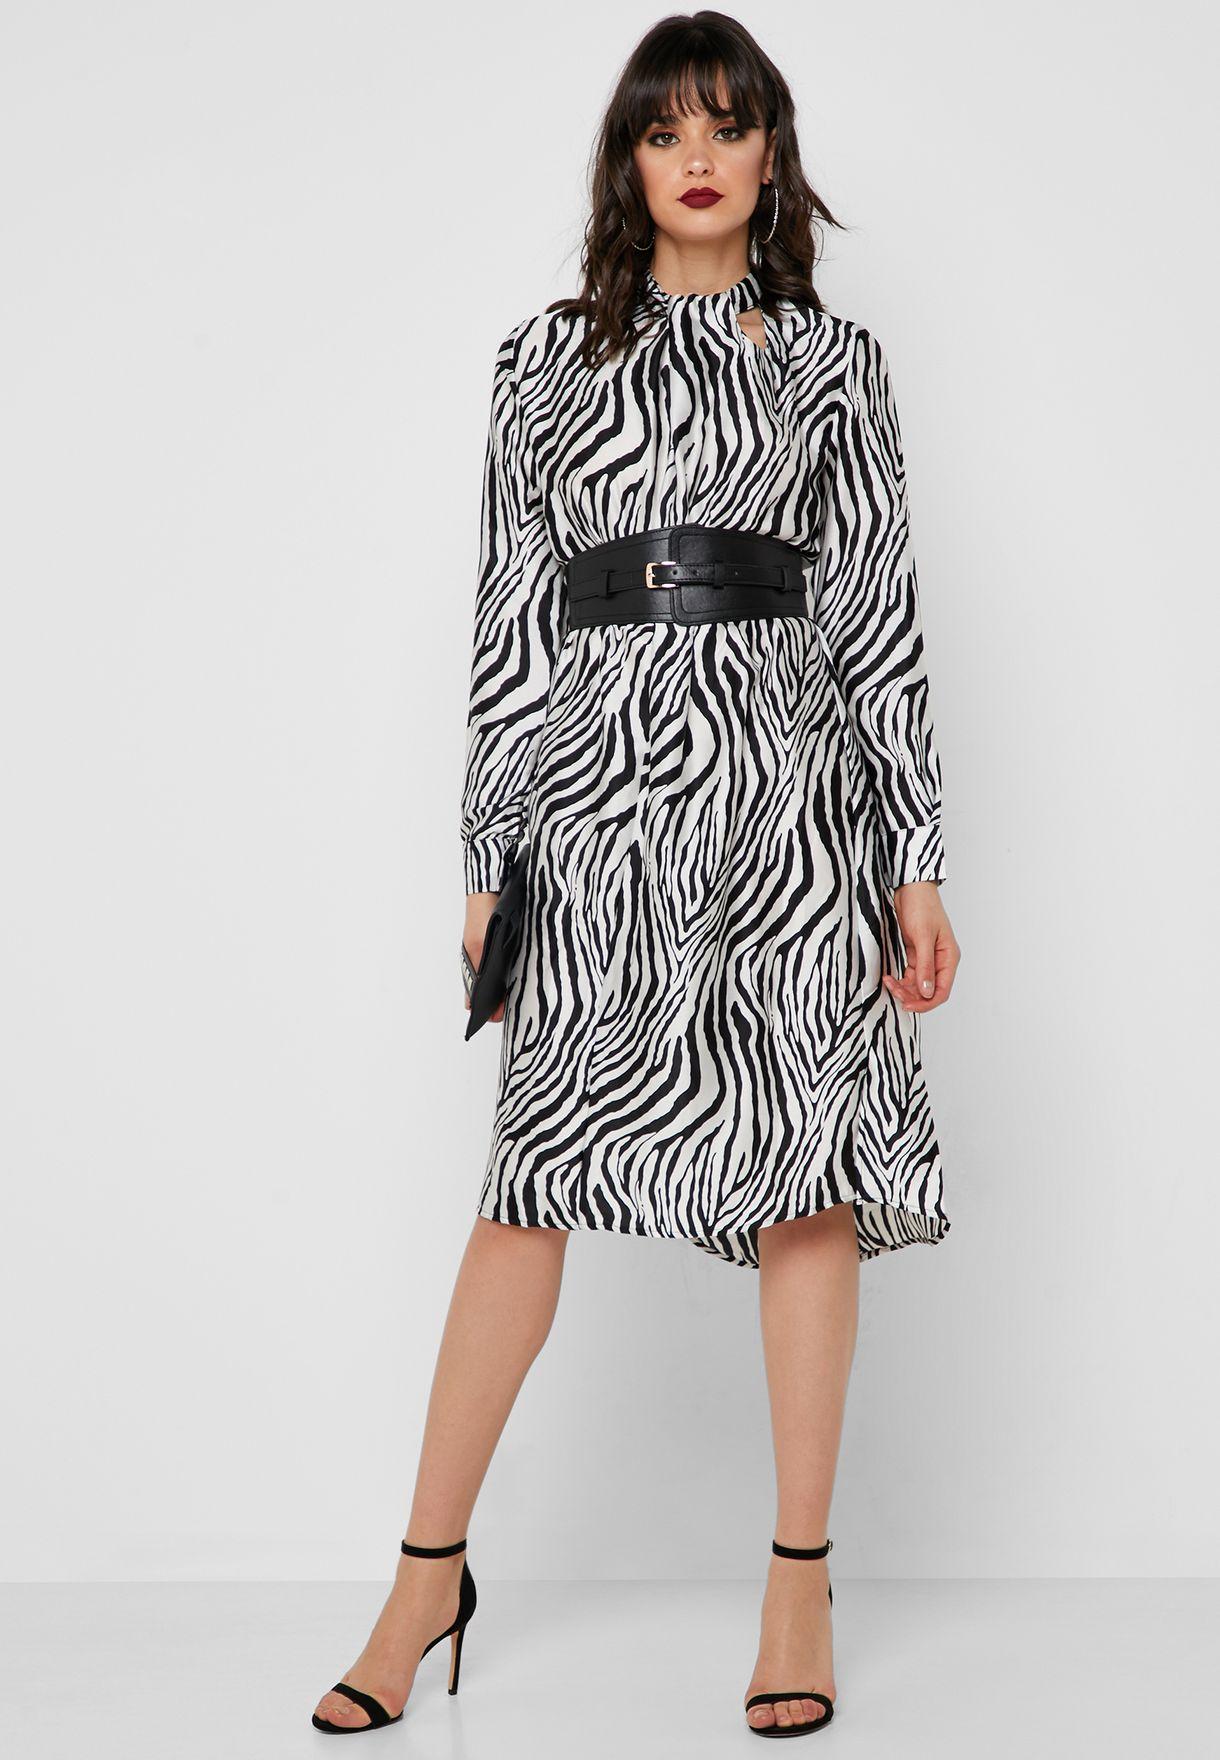 73ed3ce6301 Shop Own The Looks animalprint Belted Zebra Print Dress 128C for ...